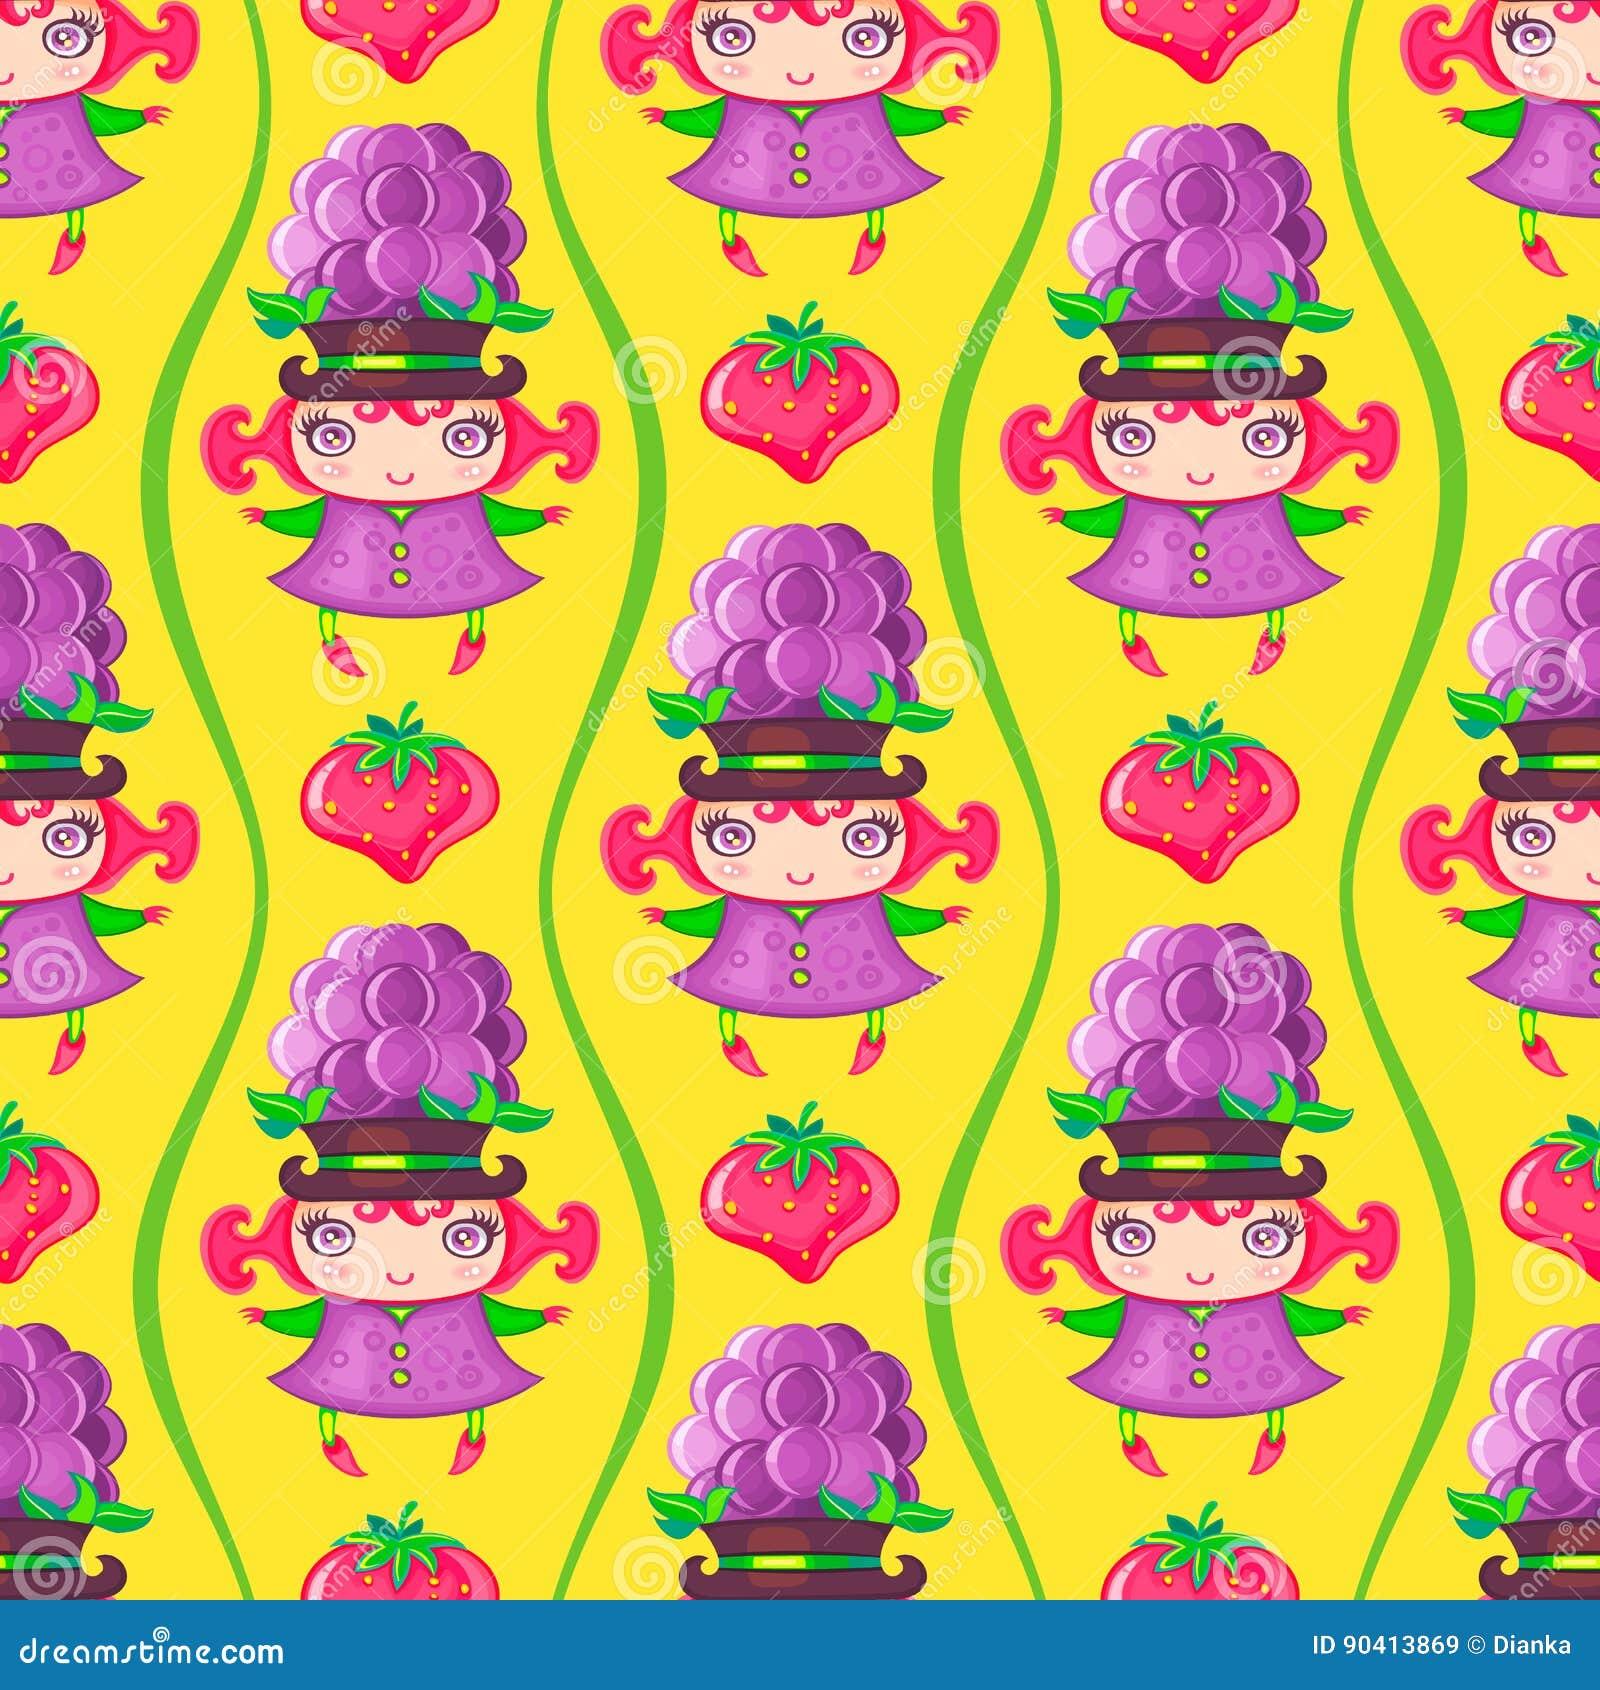 wallpaper blackberry pattern - photo #30